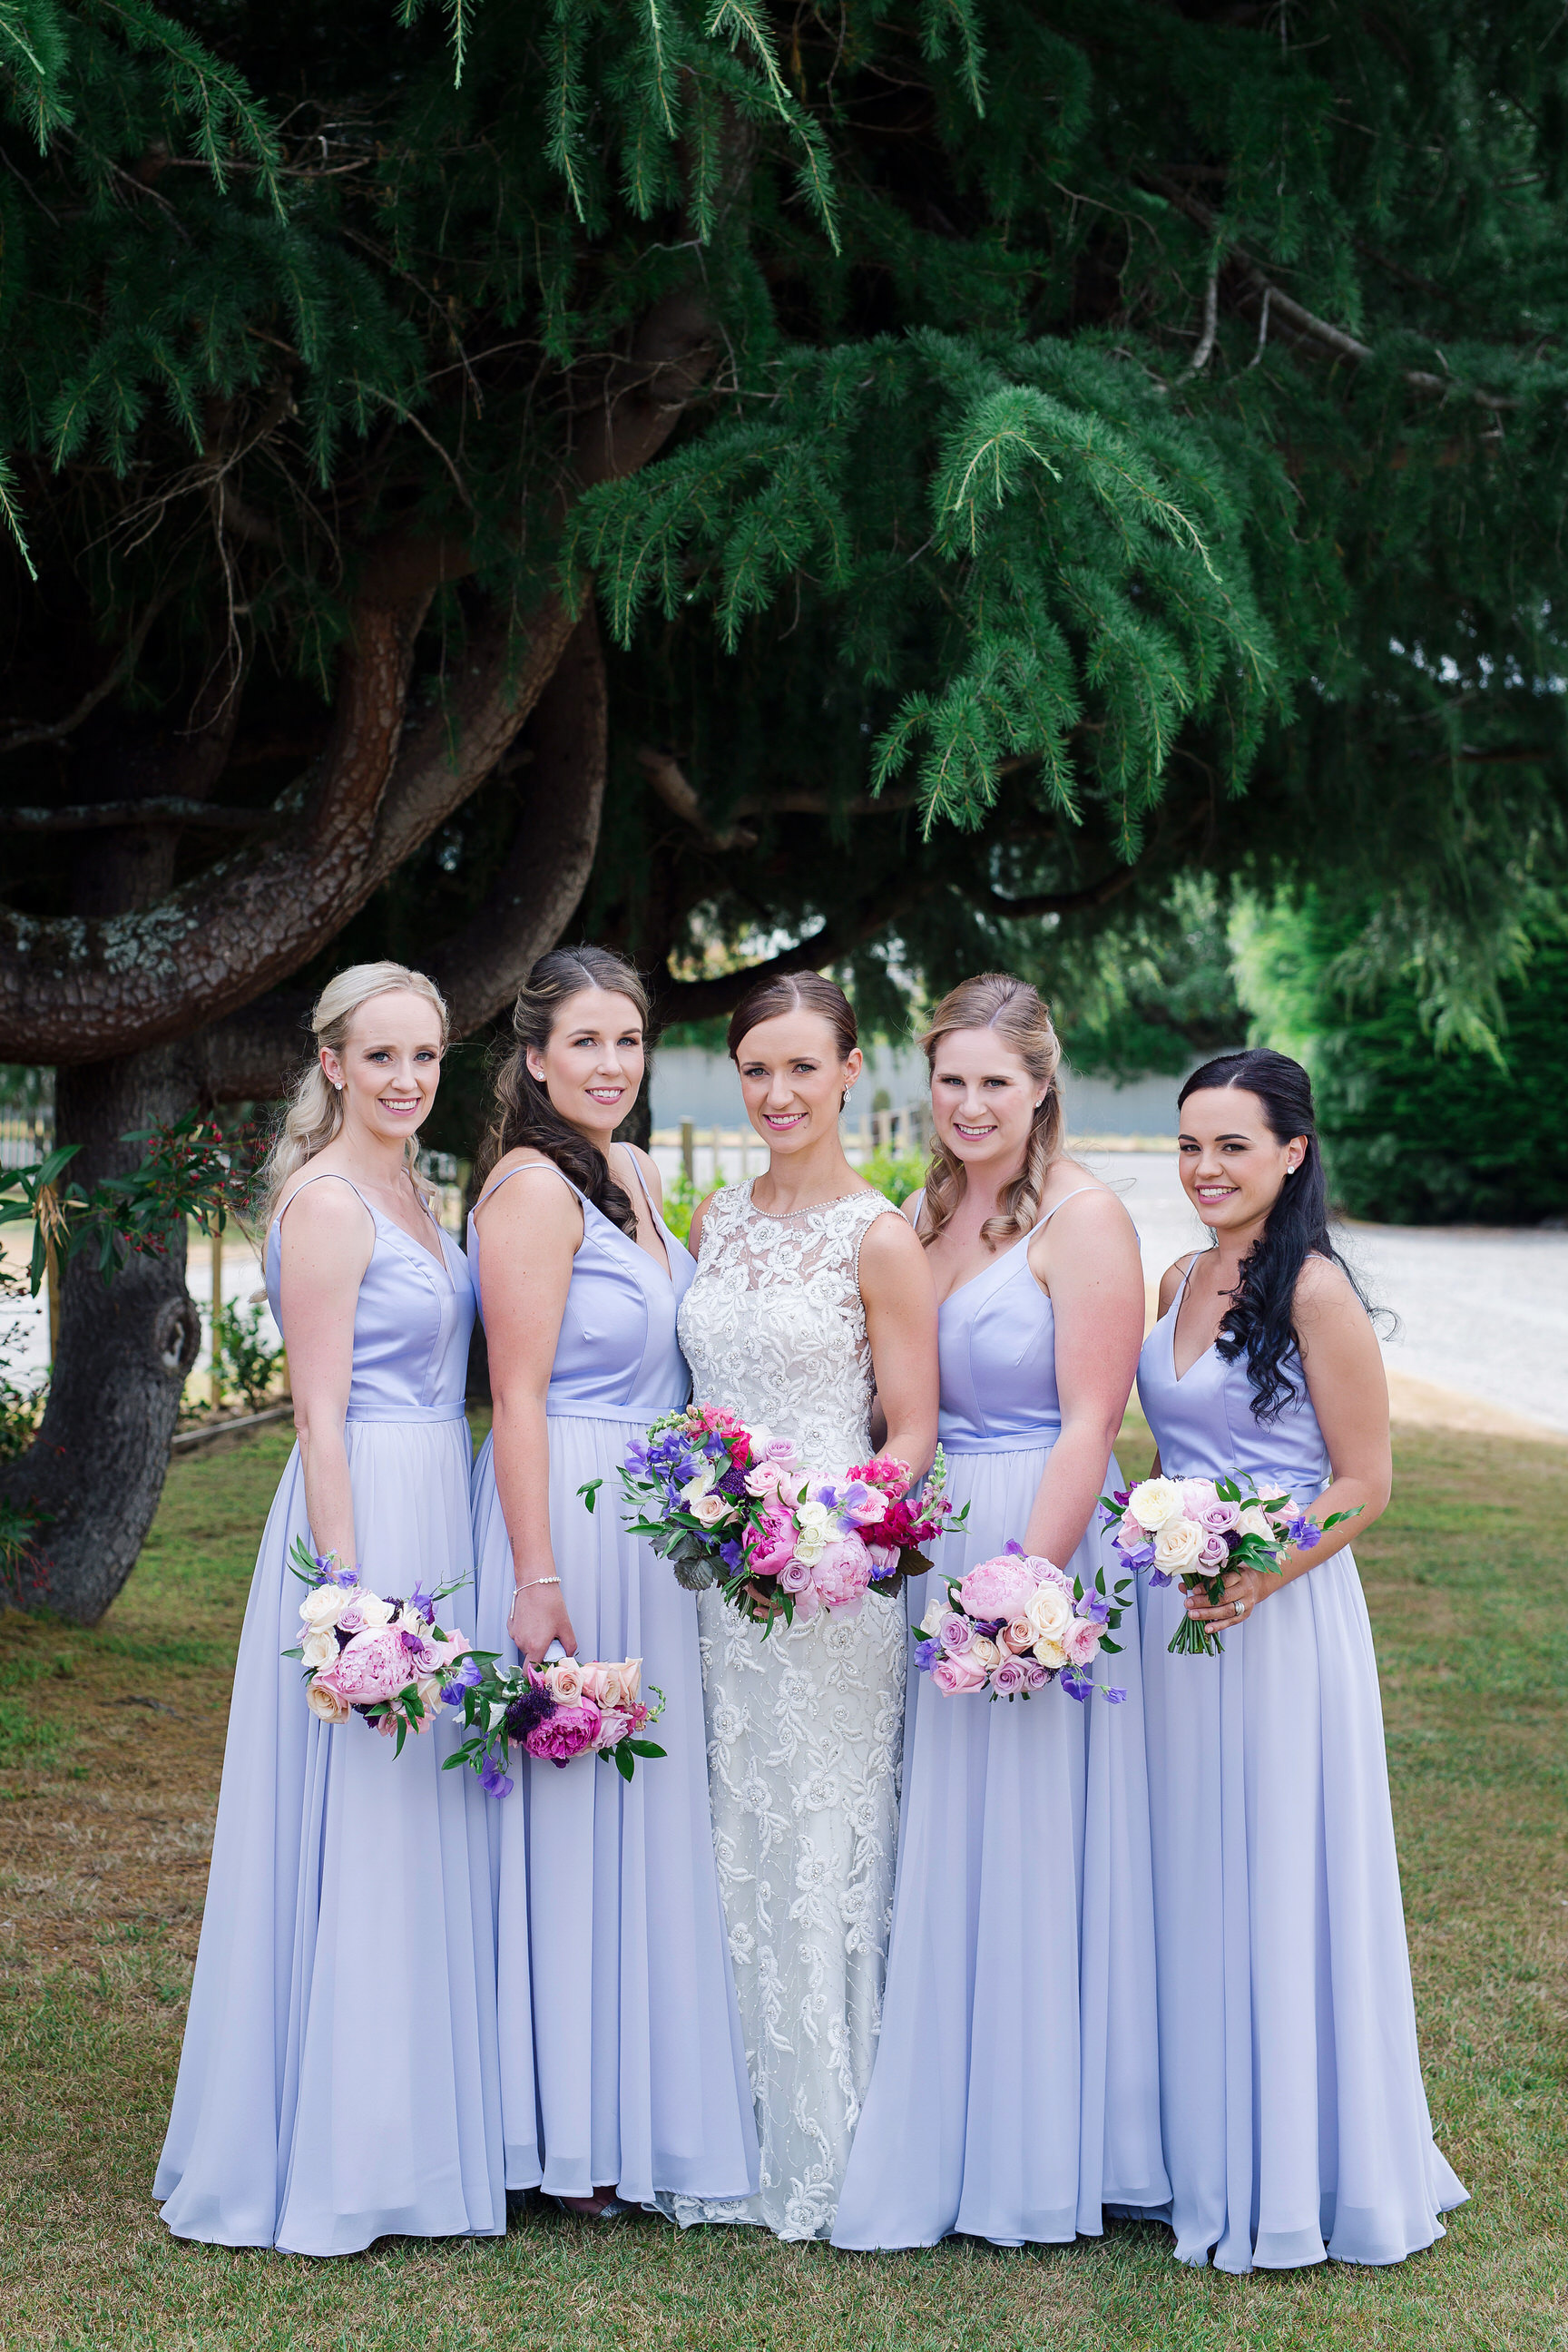 Martinborough-Poppies-Wedding-Caine-Eloise-Toni-Larsen-0036.jpg